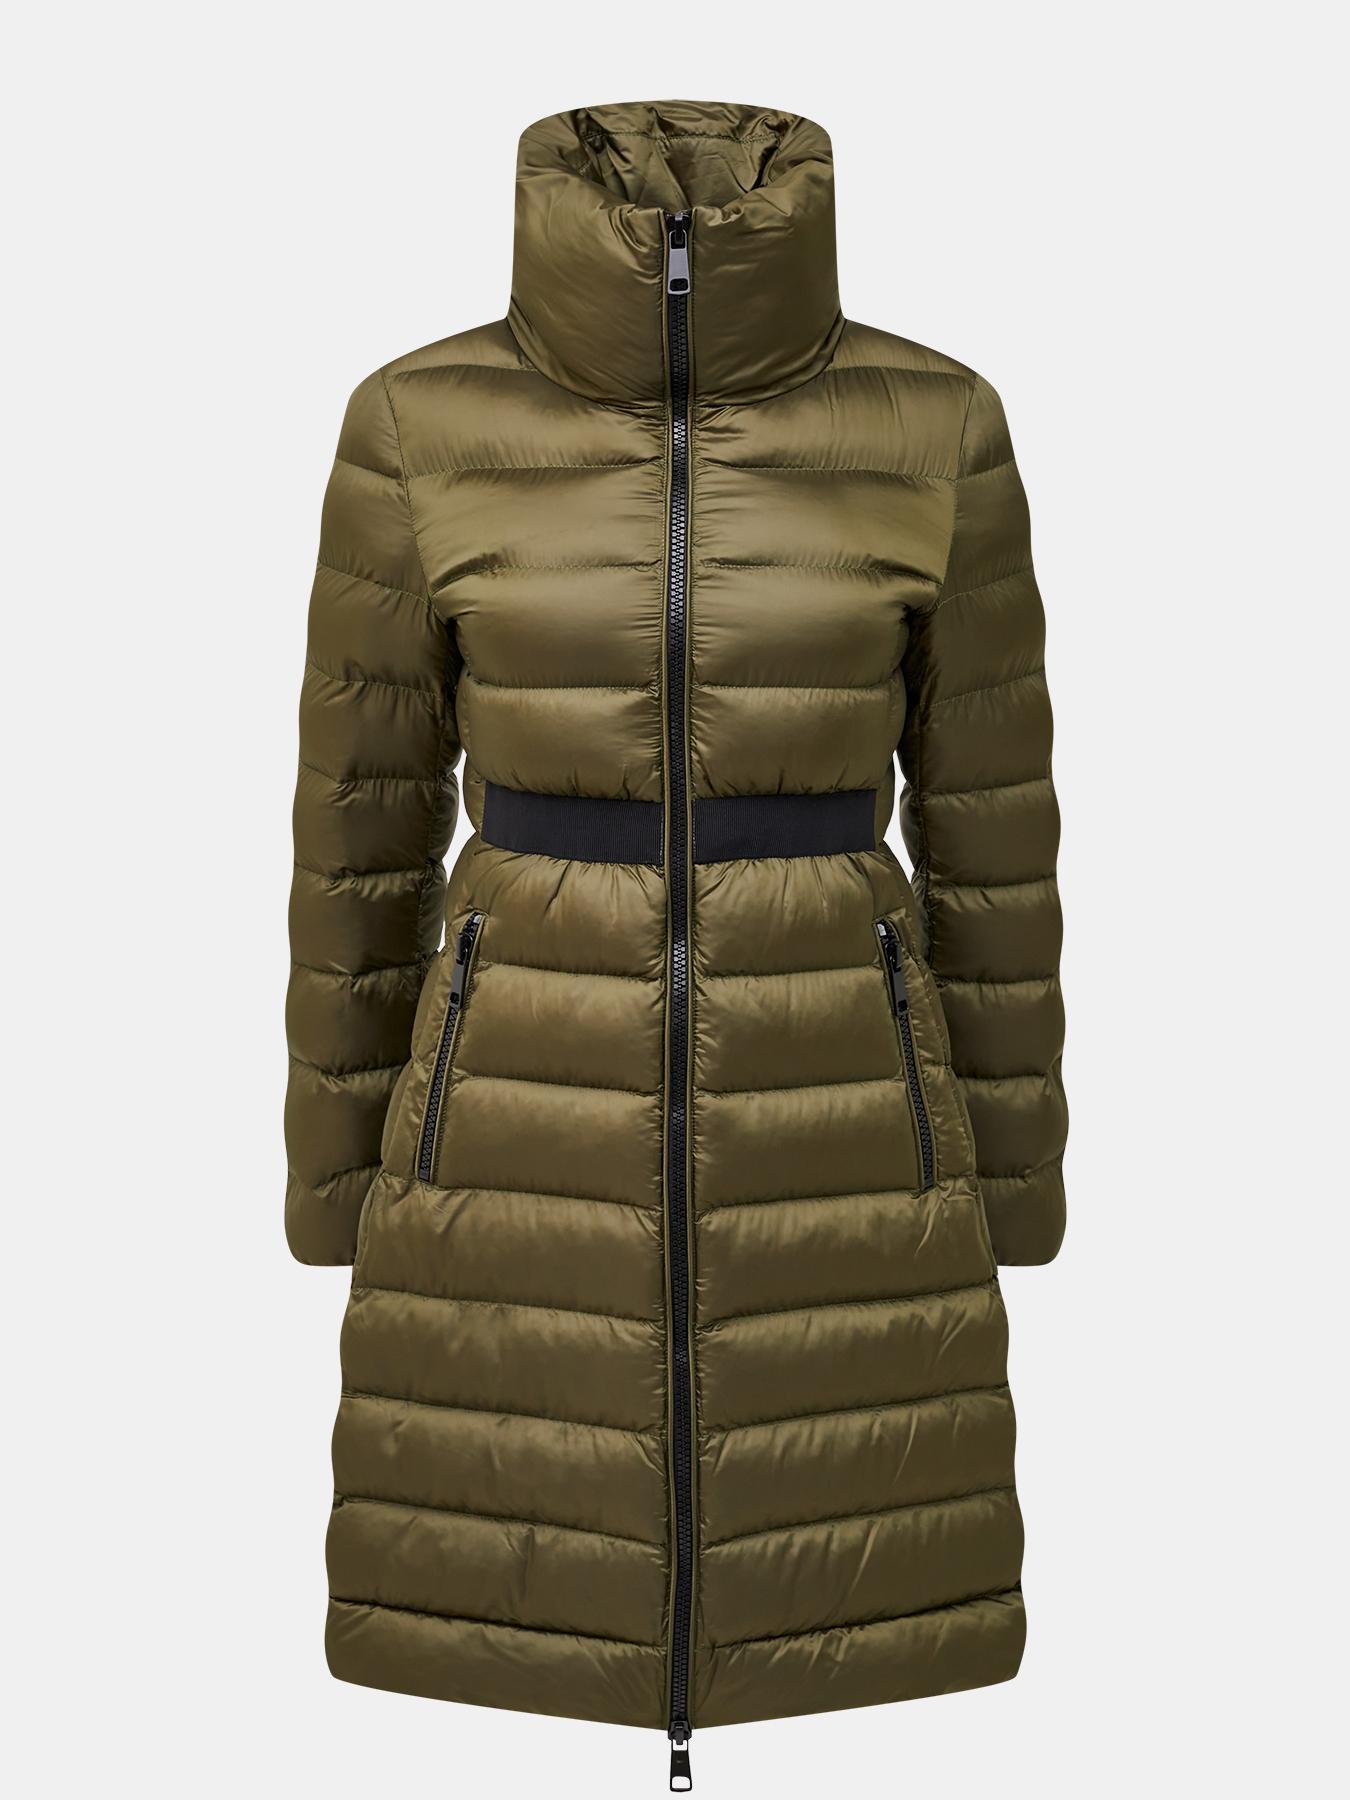 Фото - Пальто ORSA Orange Пальто пальто kata binska пальто длинные